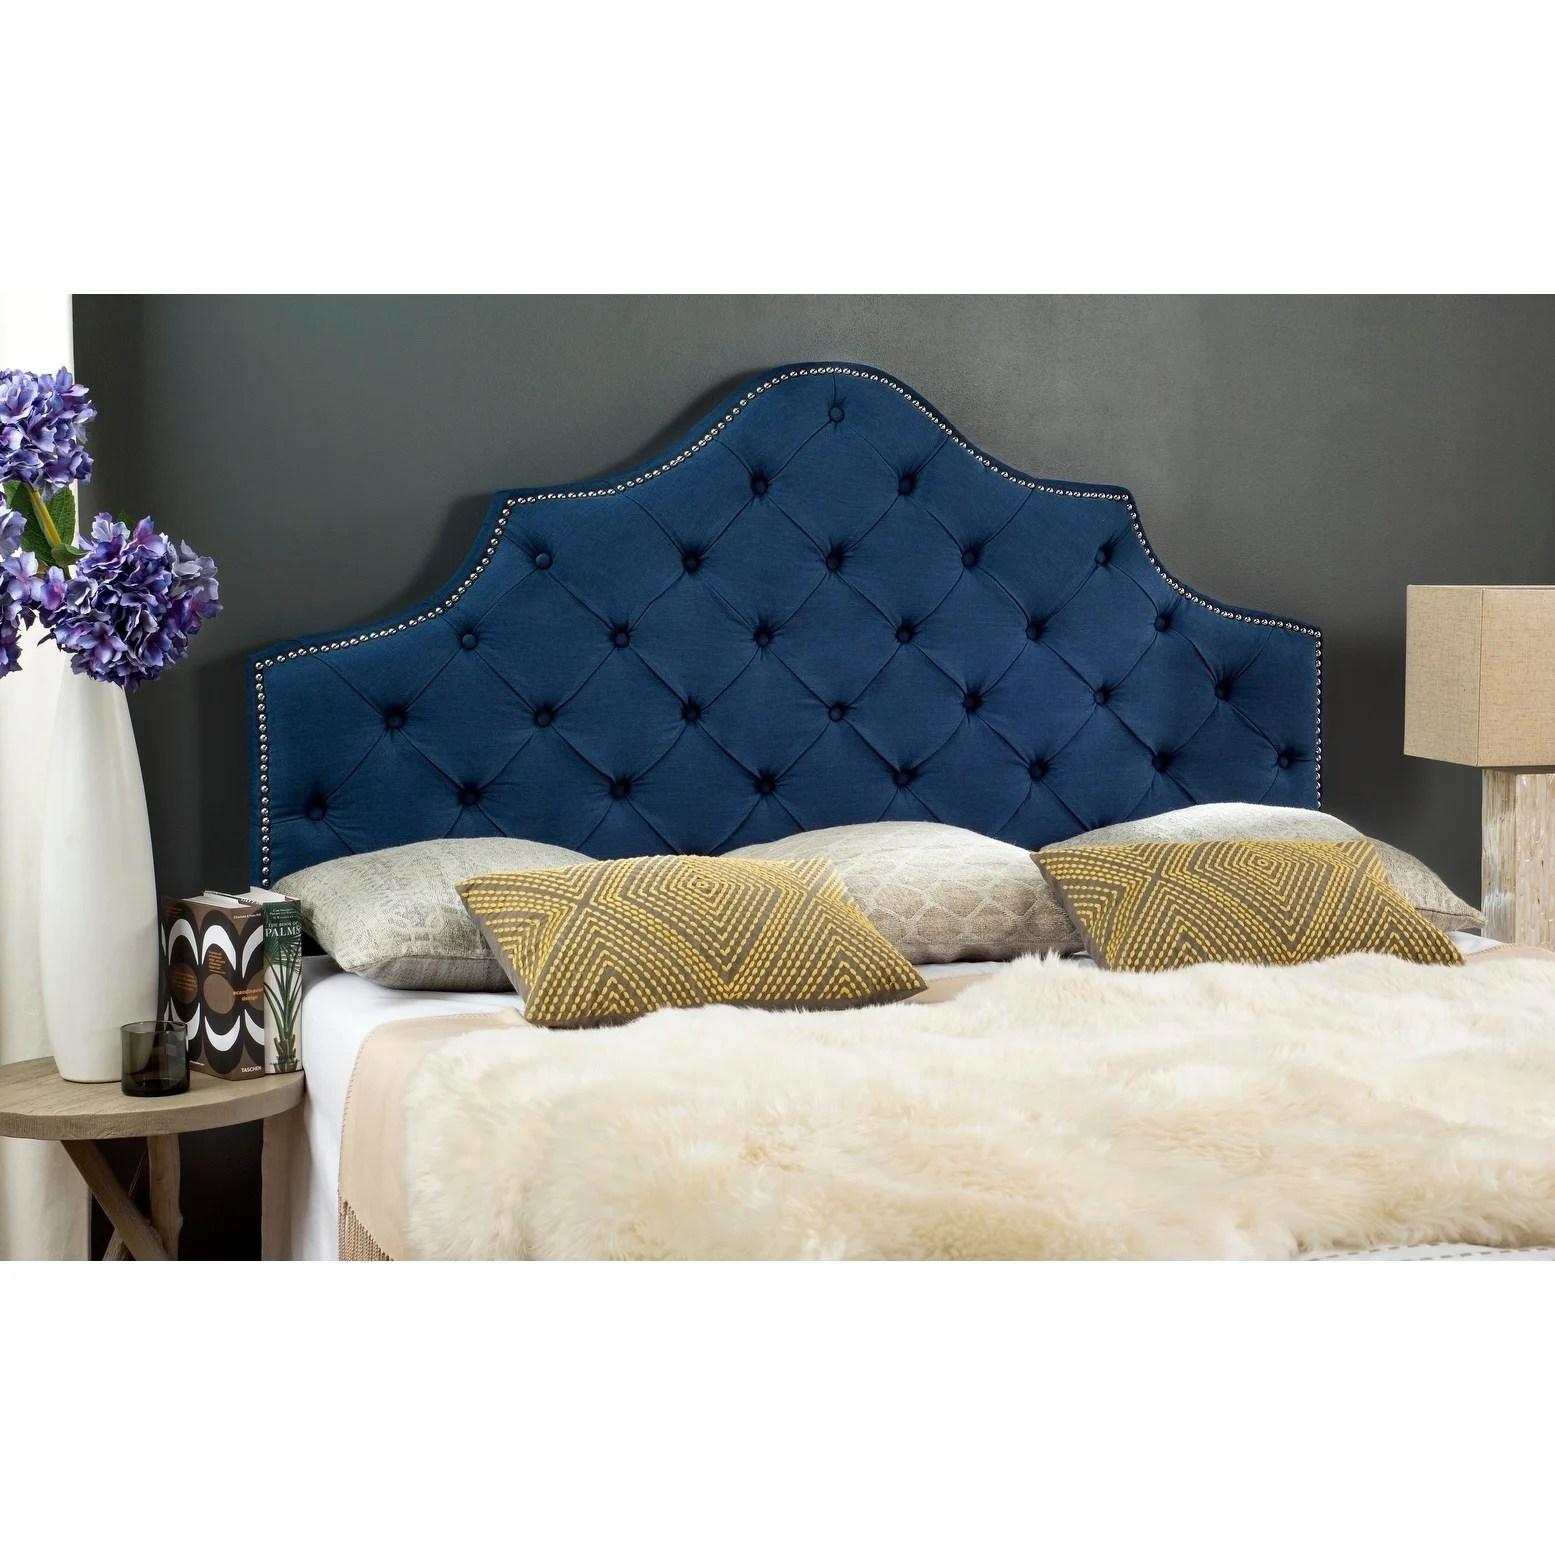 Shop Safavieh Arebelle Steel Blue Upholstered Tufted Headboard Silver Nailhead King Overstock 12014924